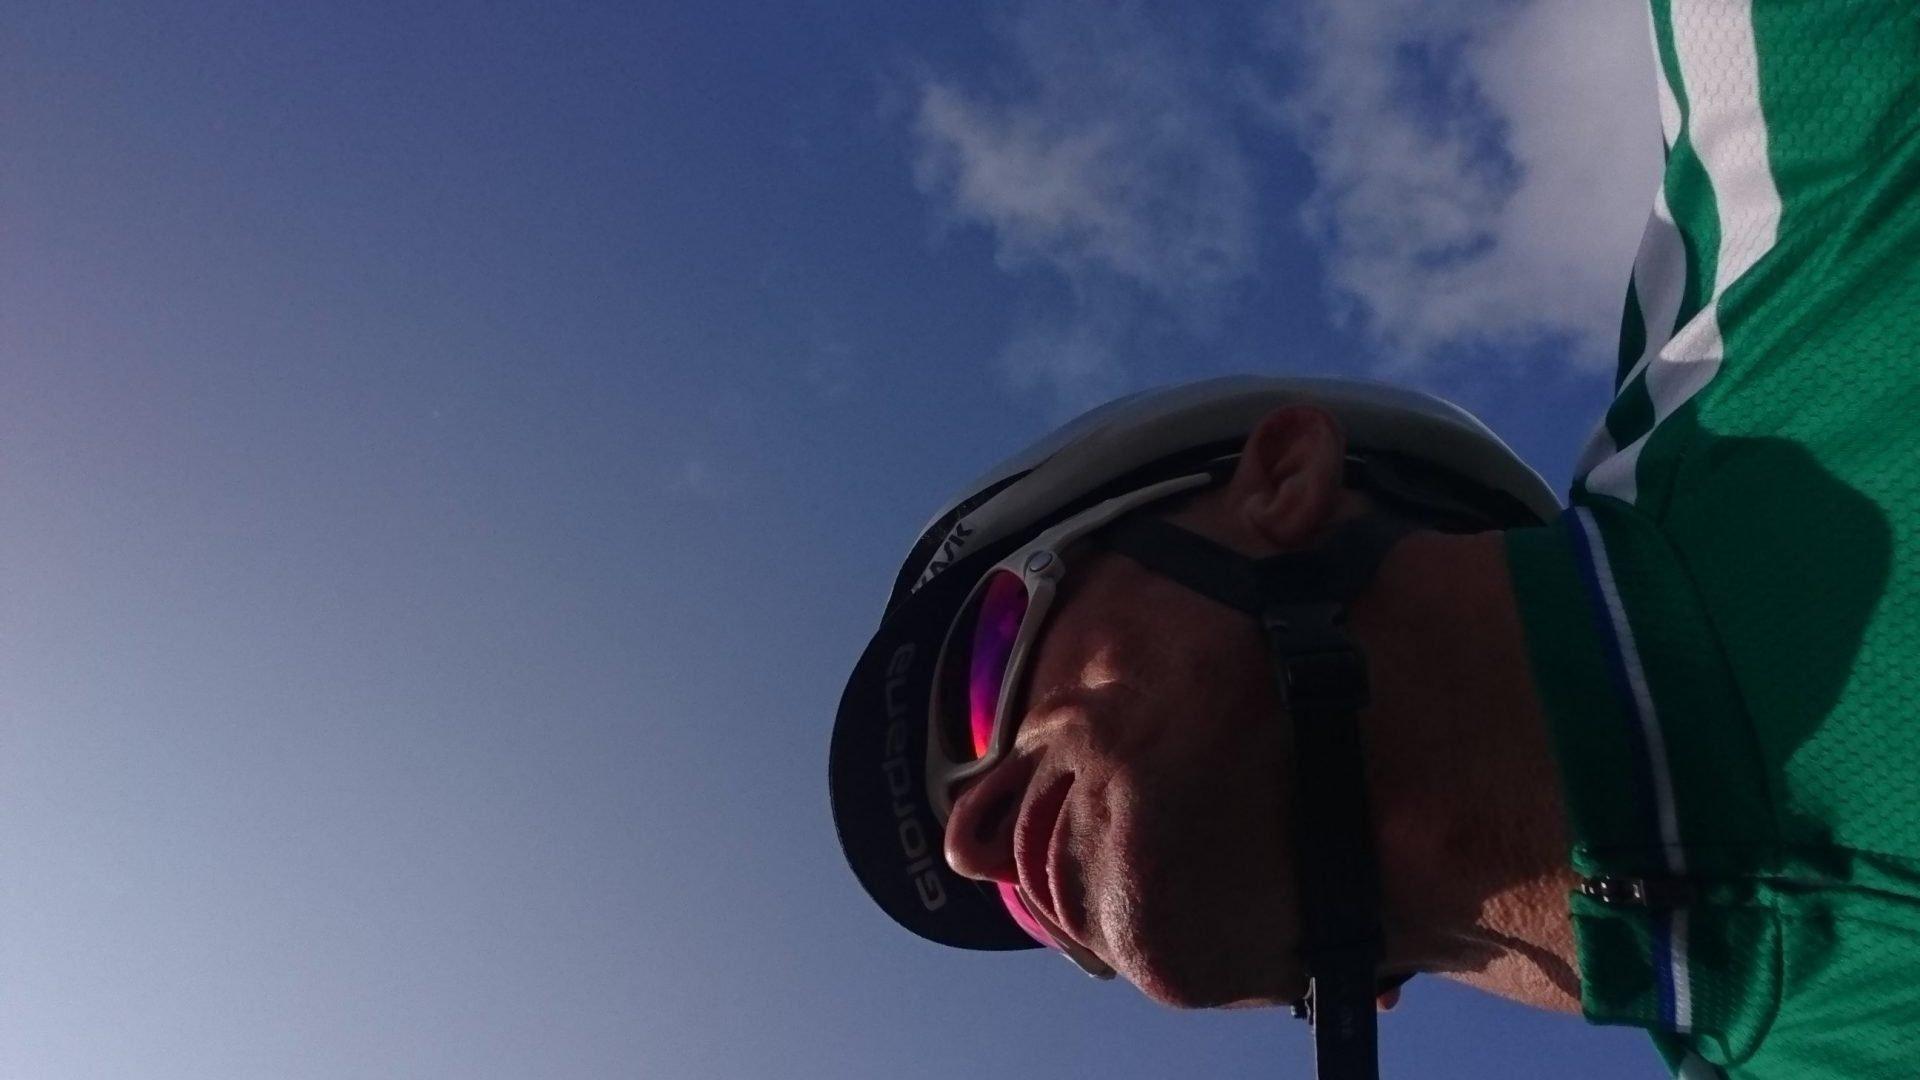 Campag_greem_me_bike